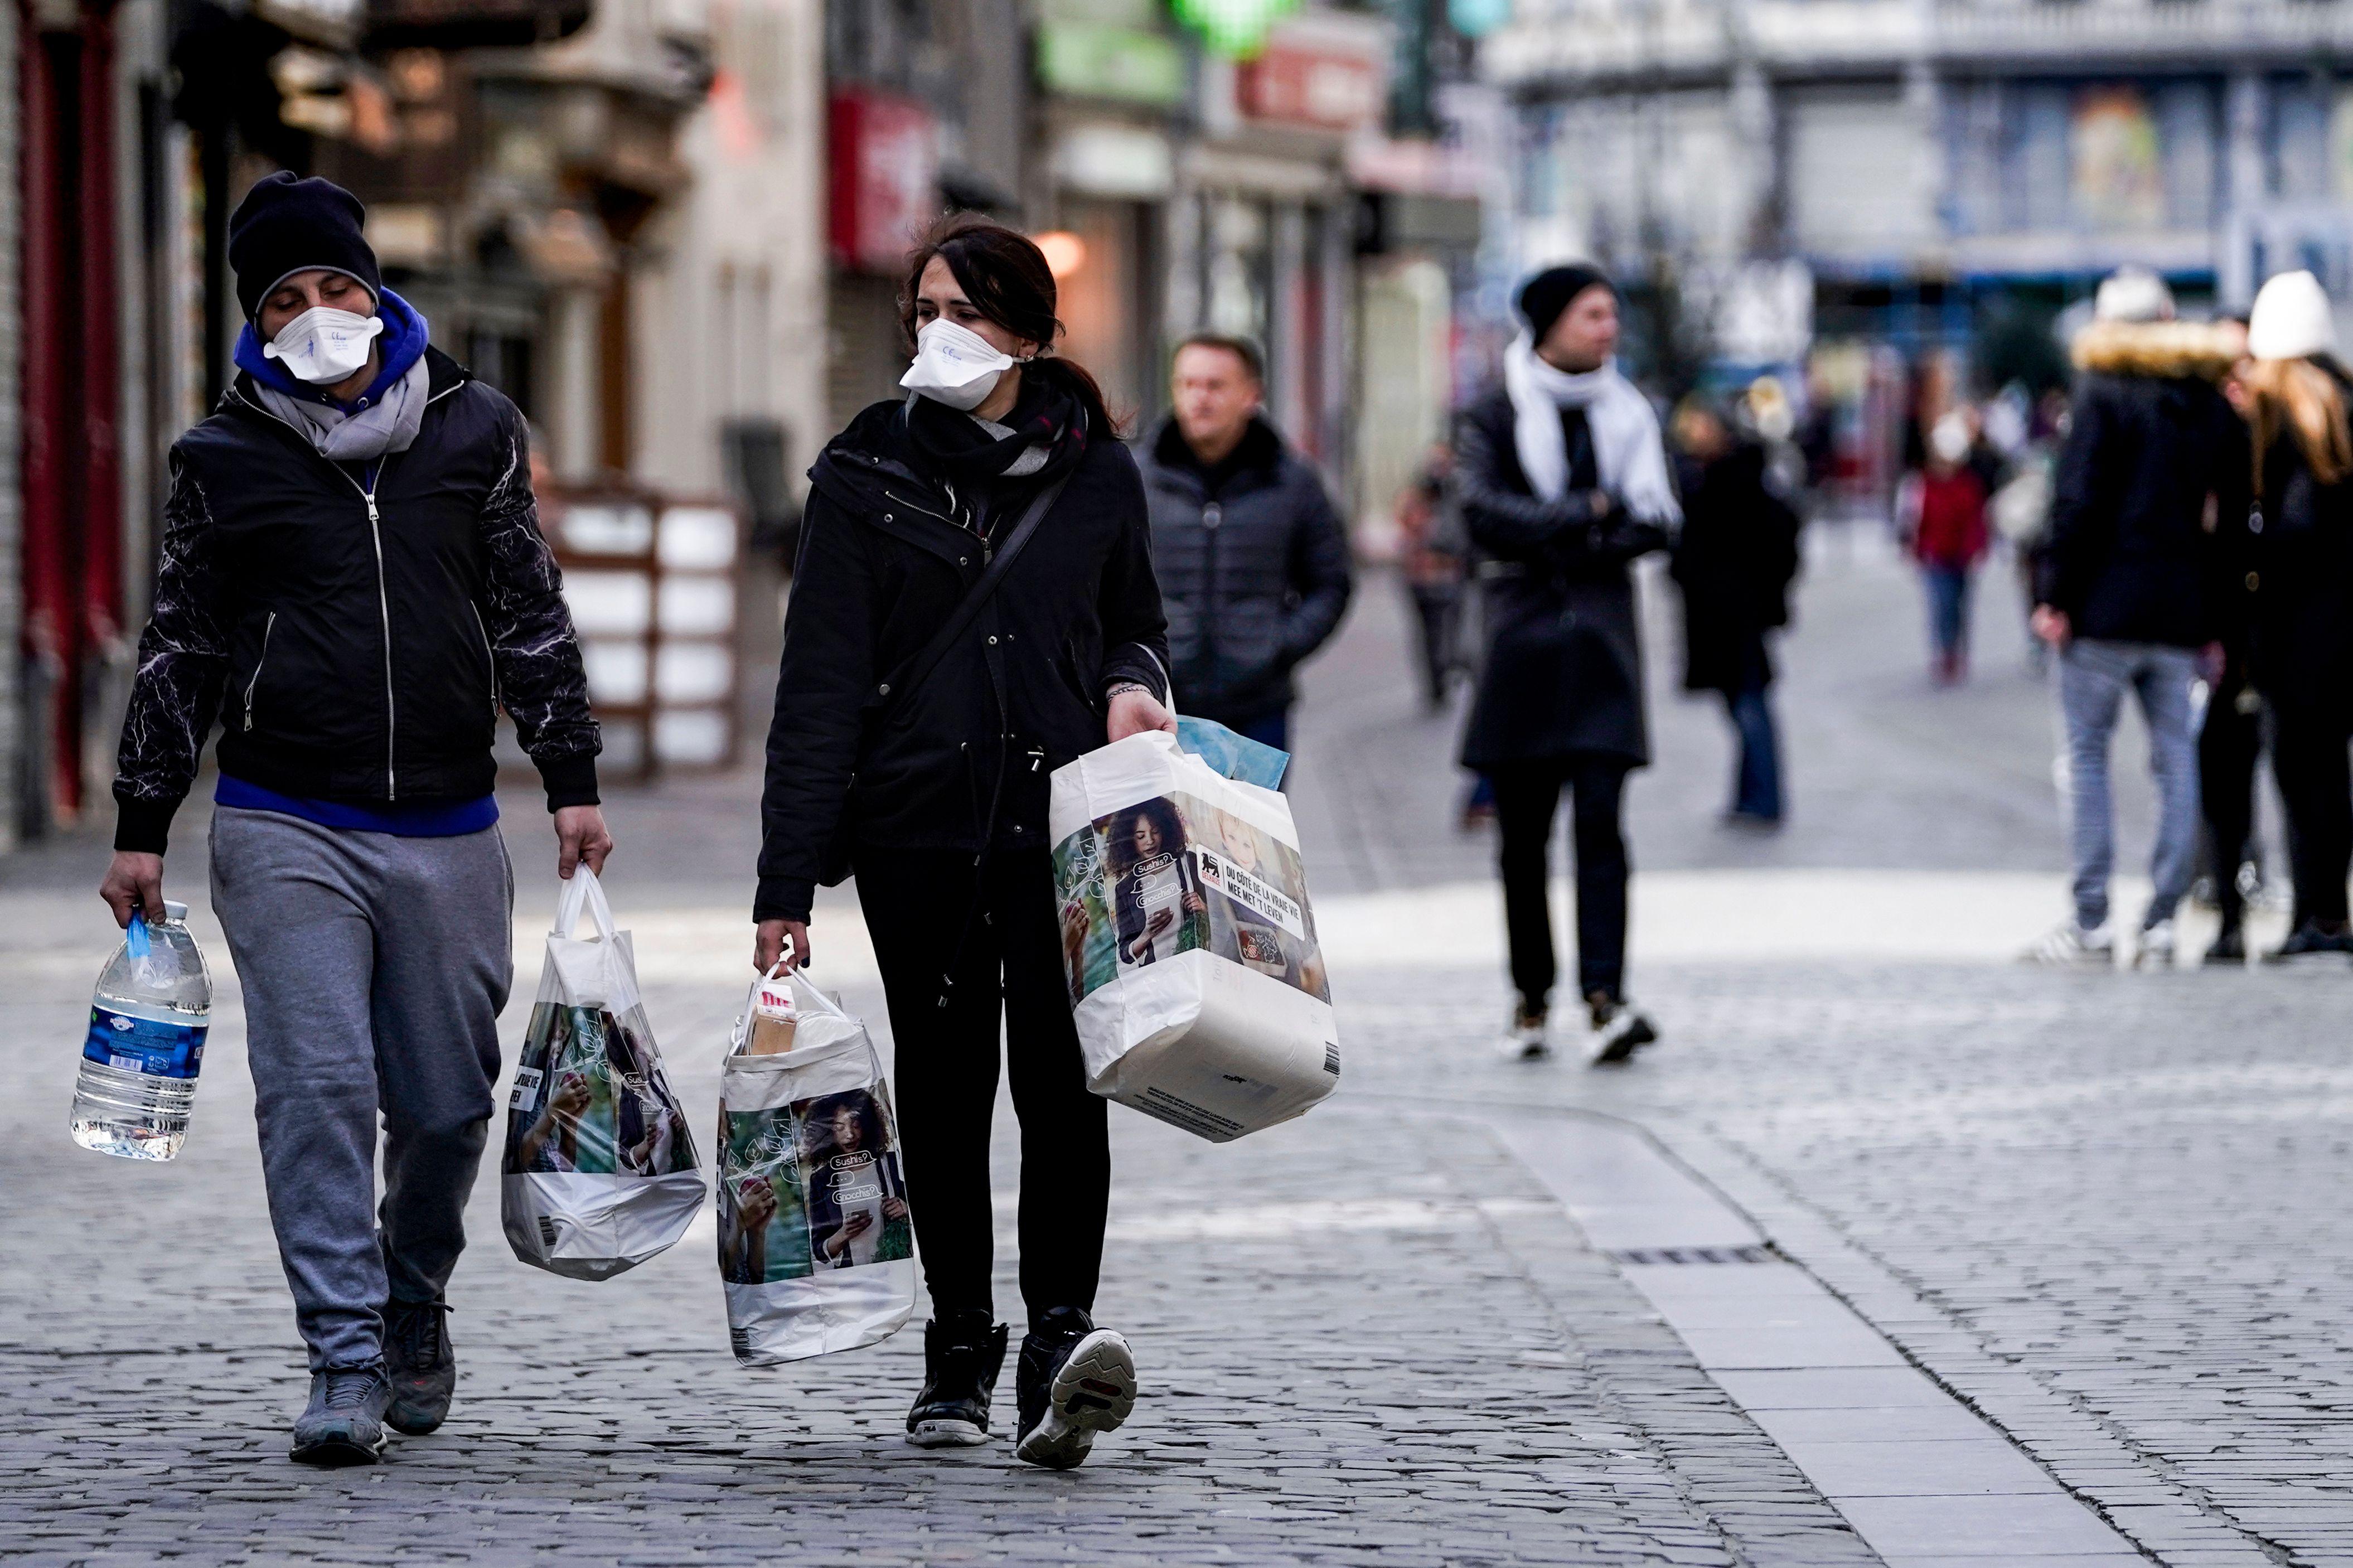 Belgium's coronavirus death toll tops 1,000